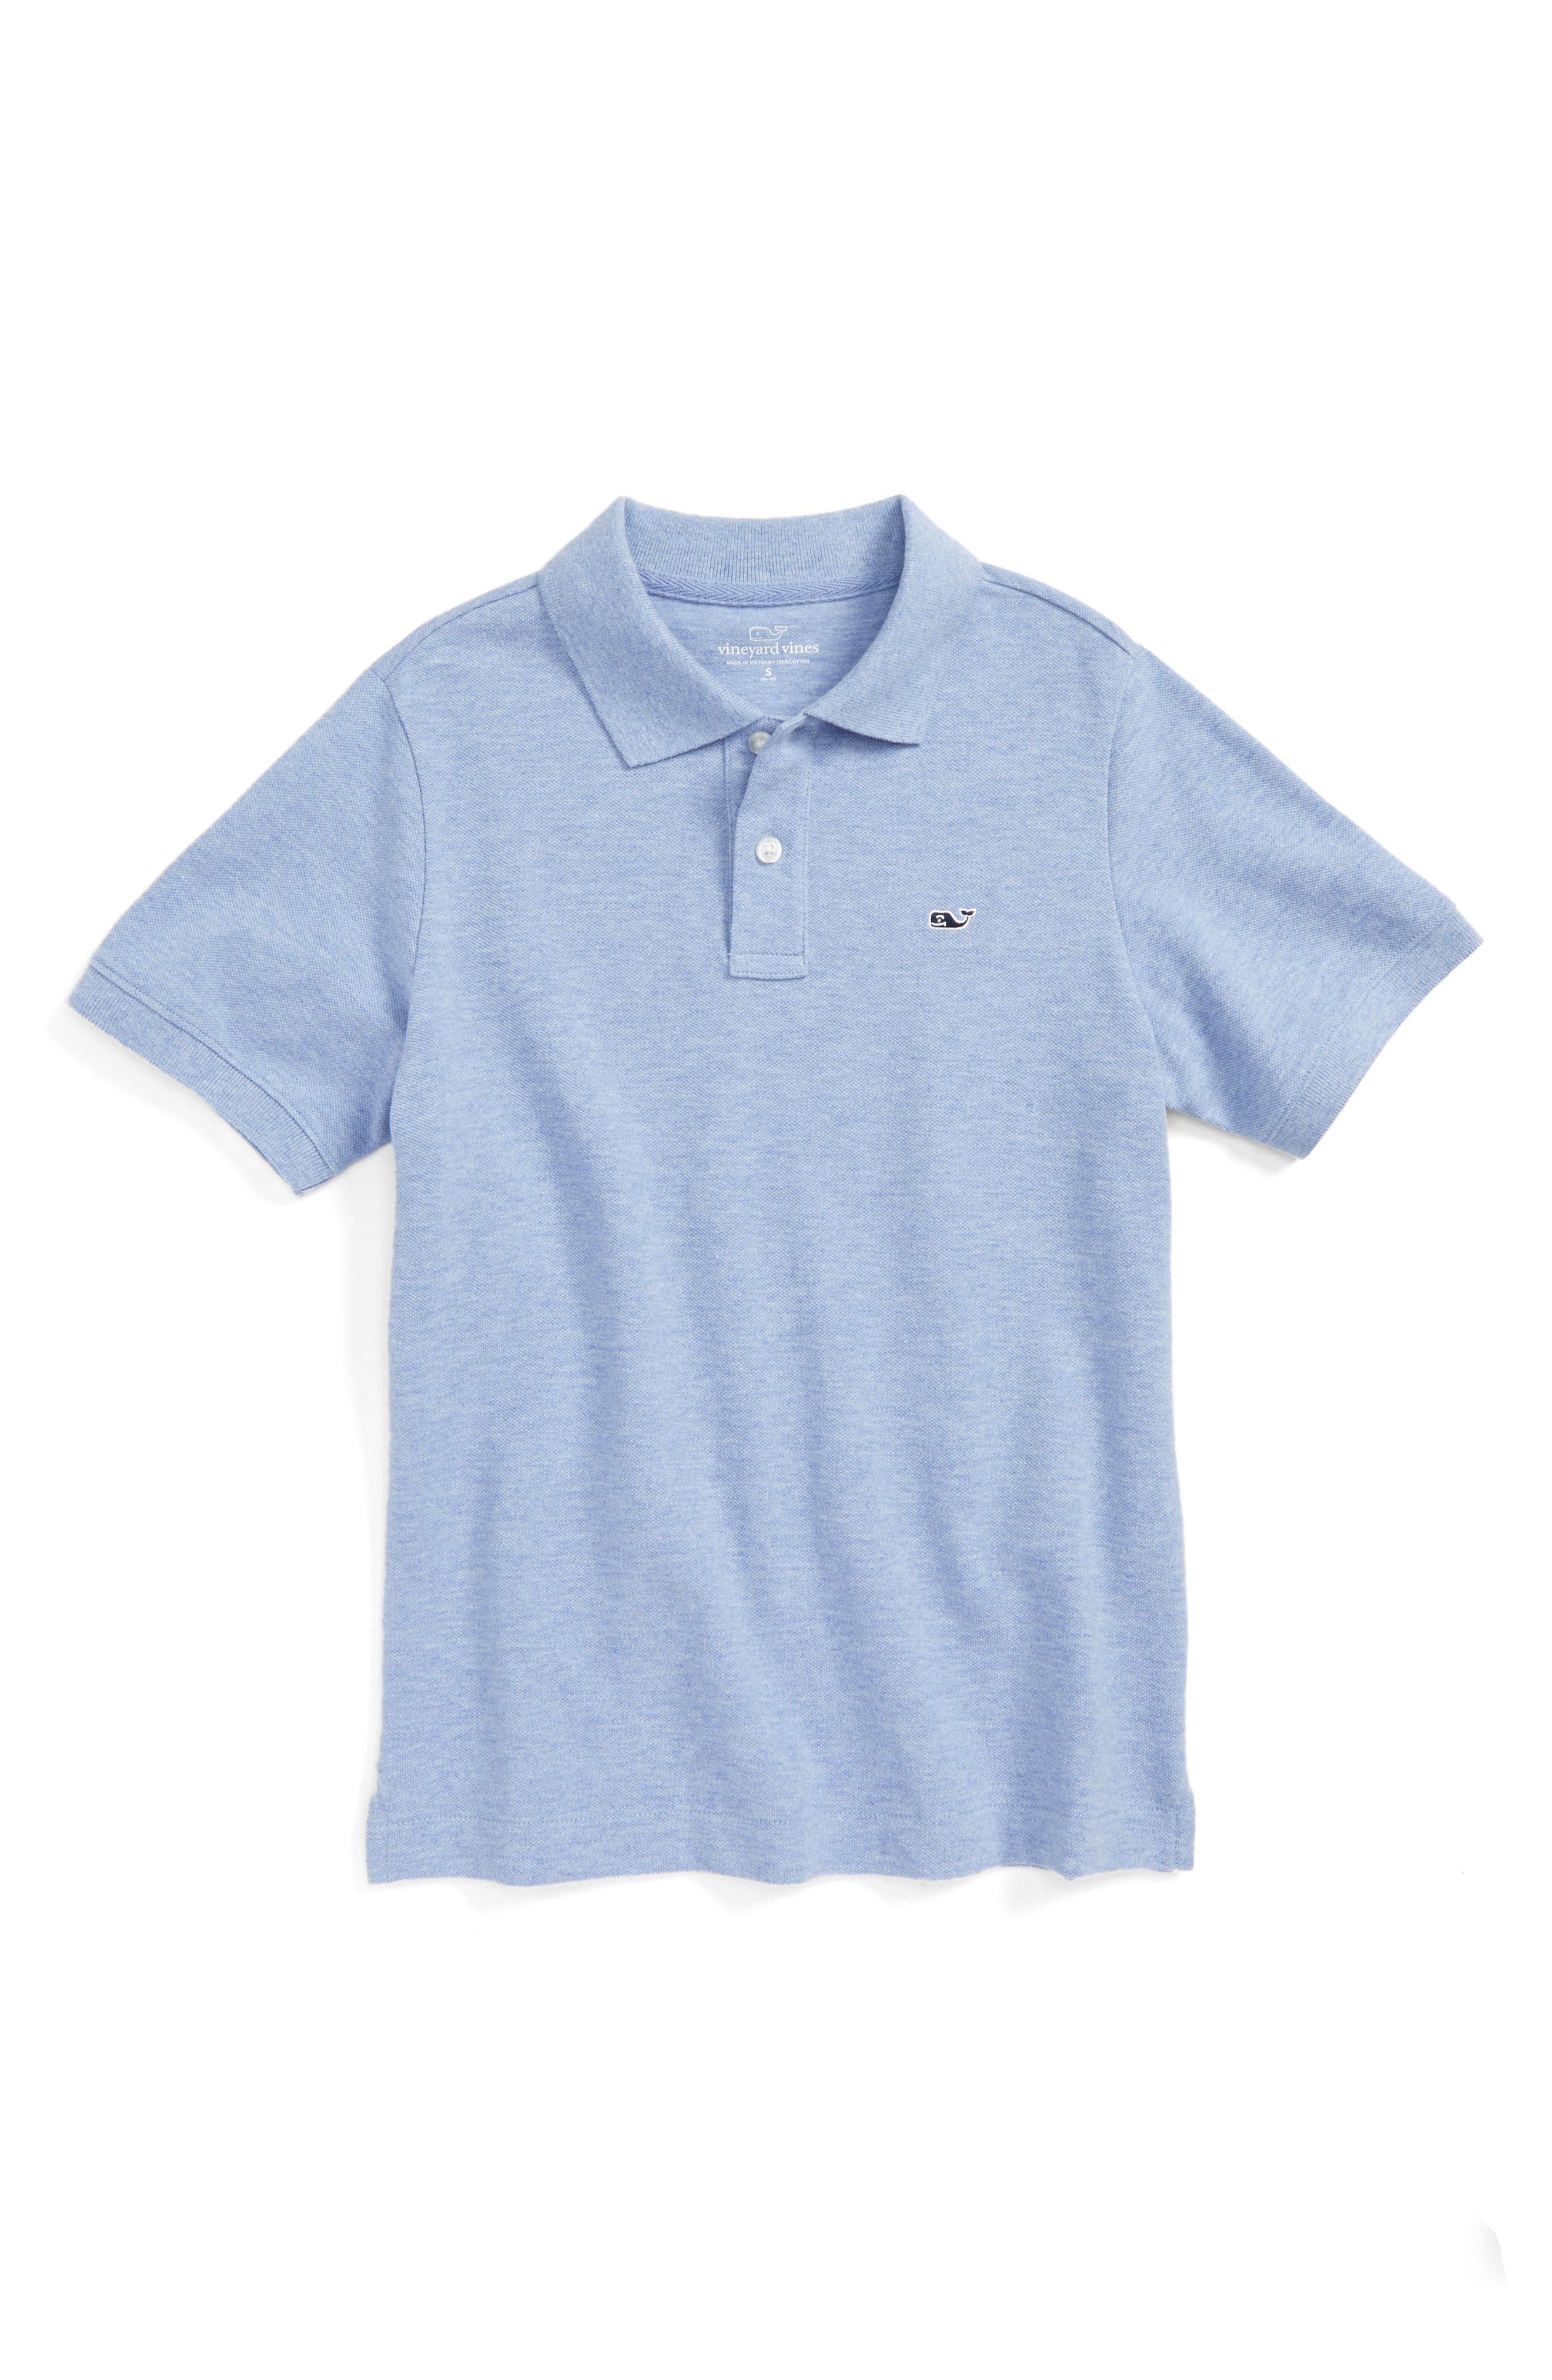 VINEYARD VINES Classic Piqué Polo